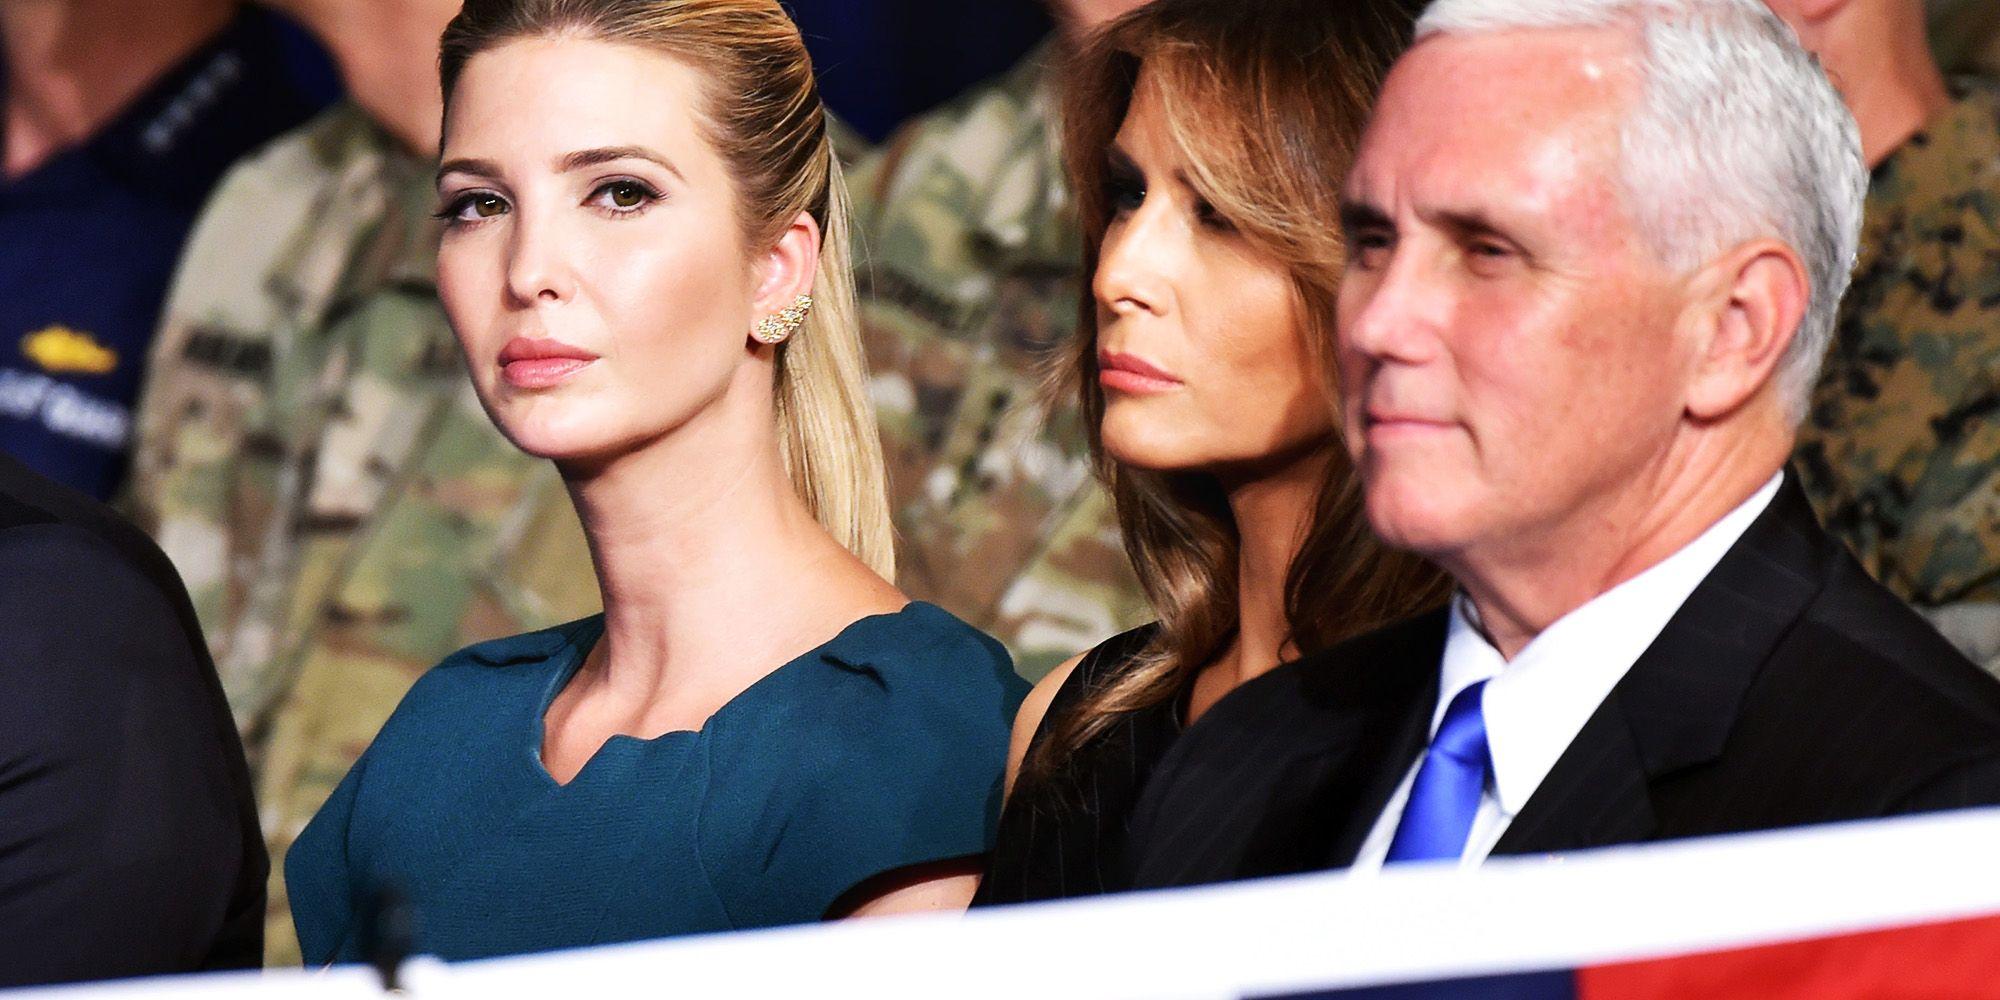 Ivanka Trump is blocking Obama's gender pay gap policy